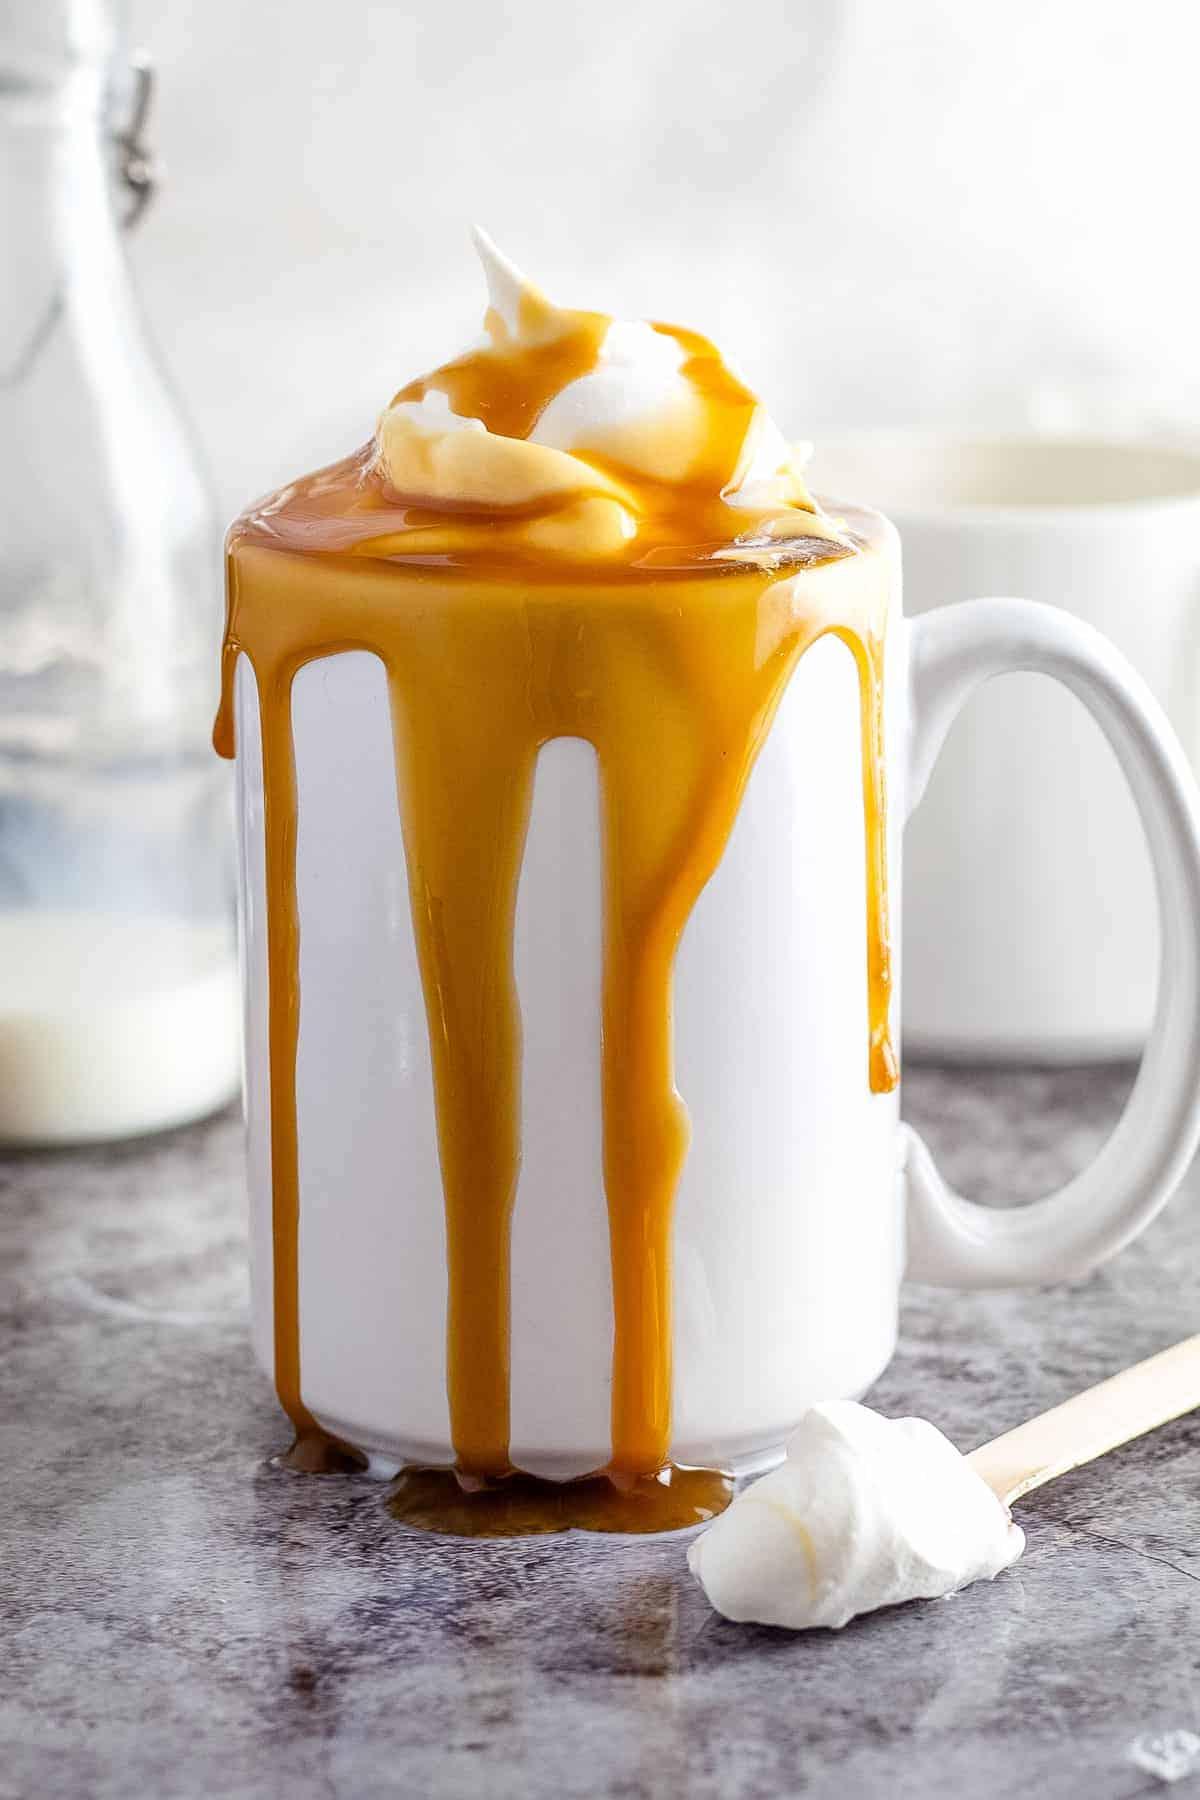 Caramel Macchiato in white mug on gray background